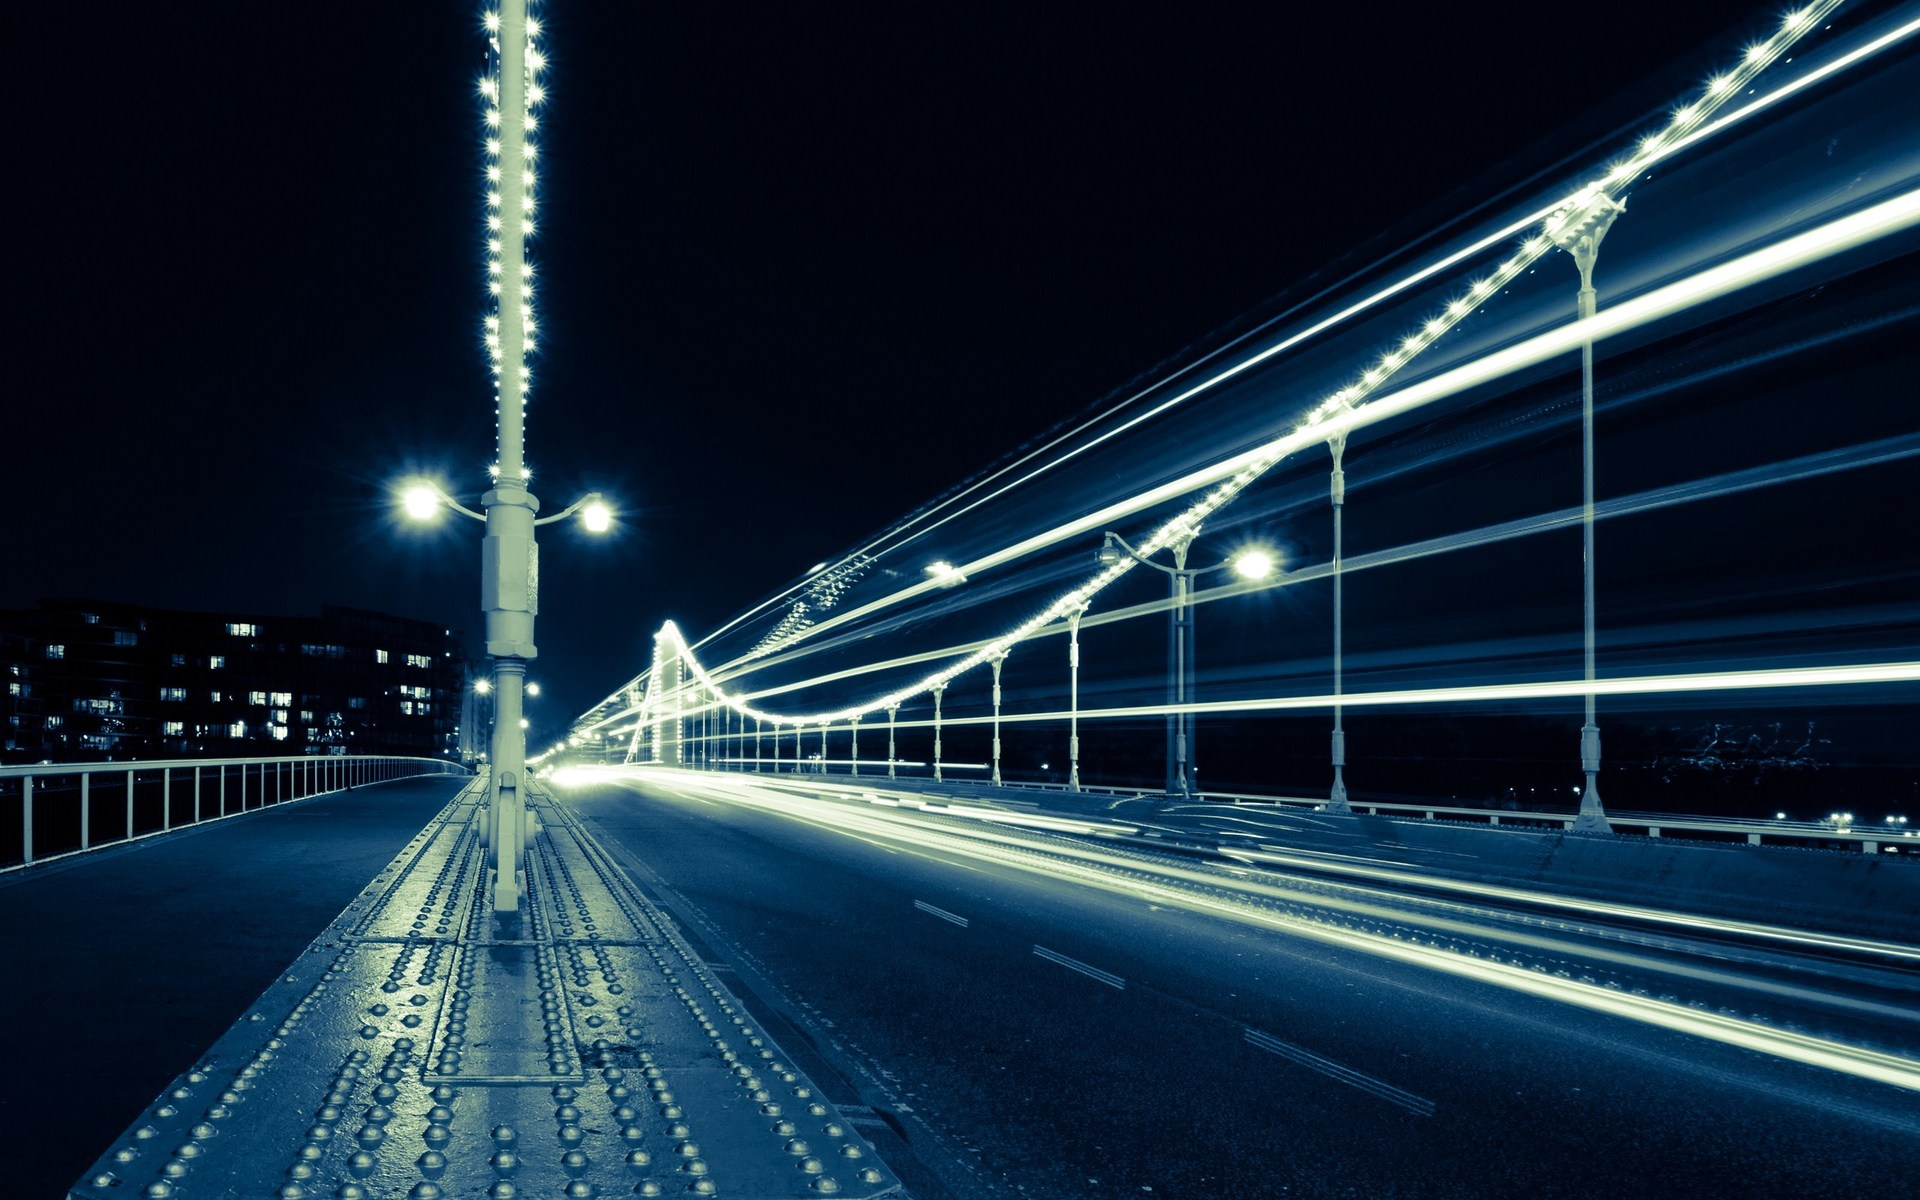 light bridge wallpaper - photo #32